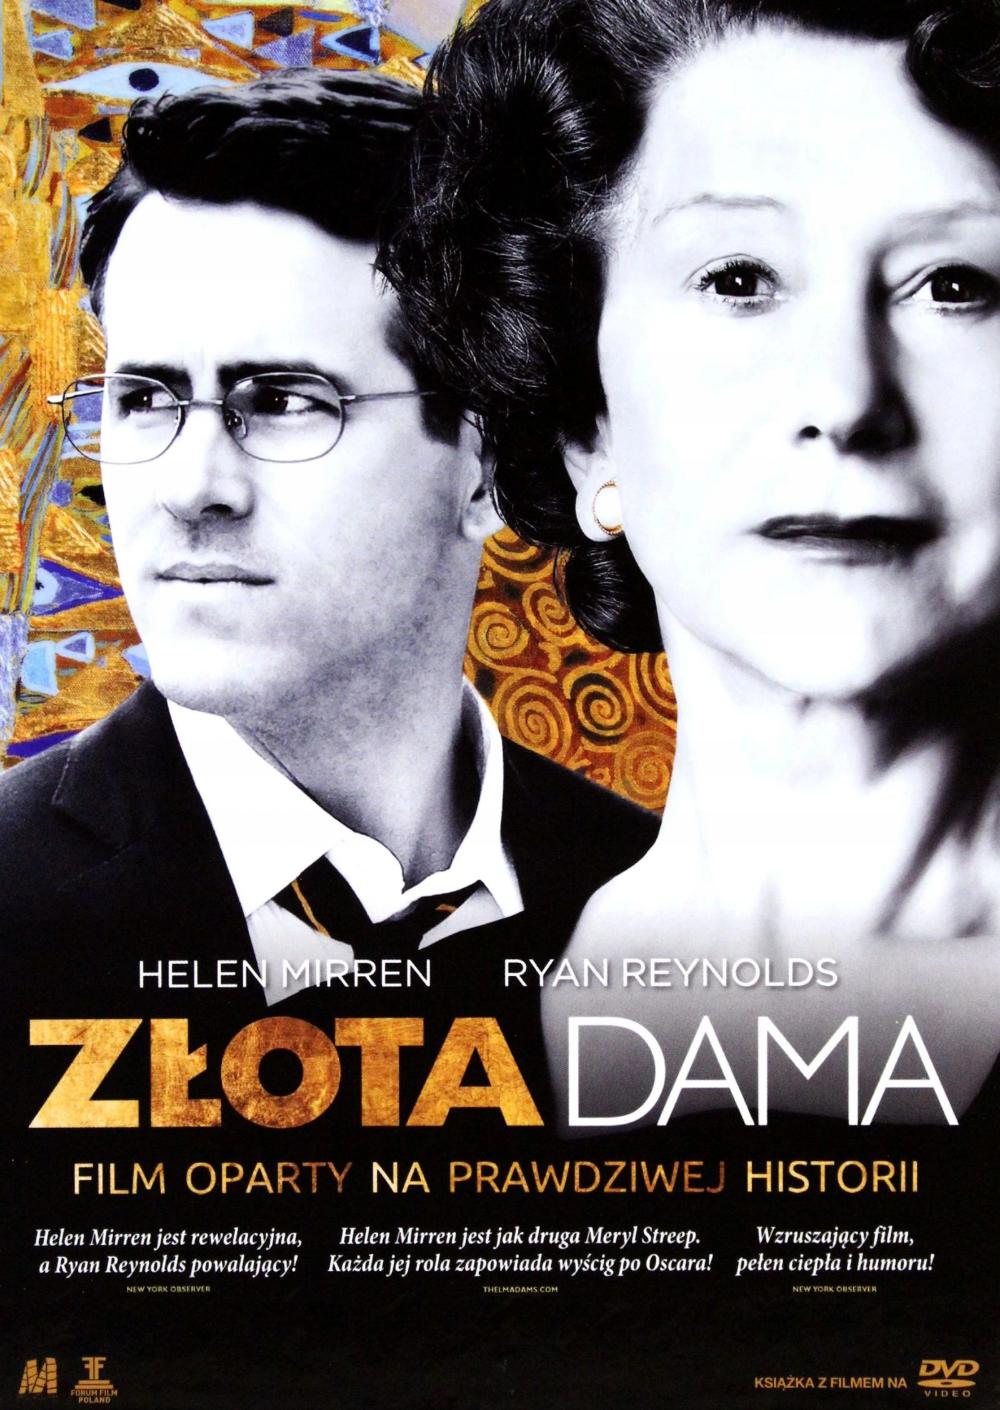 Zlota Dama Helen Mirren Dvd 8288557322 Oficjalne Archiwum Allegro Woman In Gold Helen Mirren Film